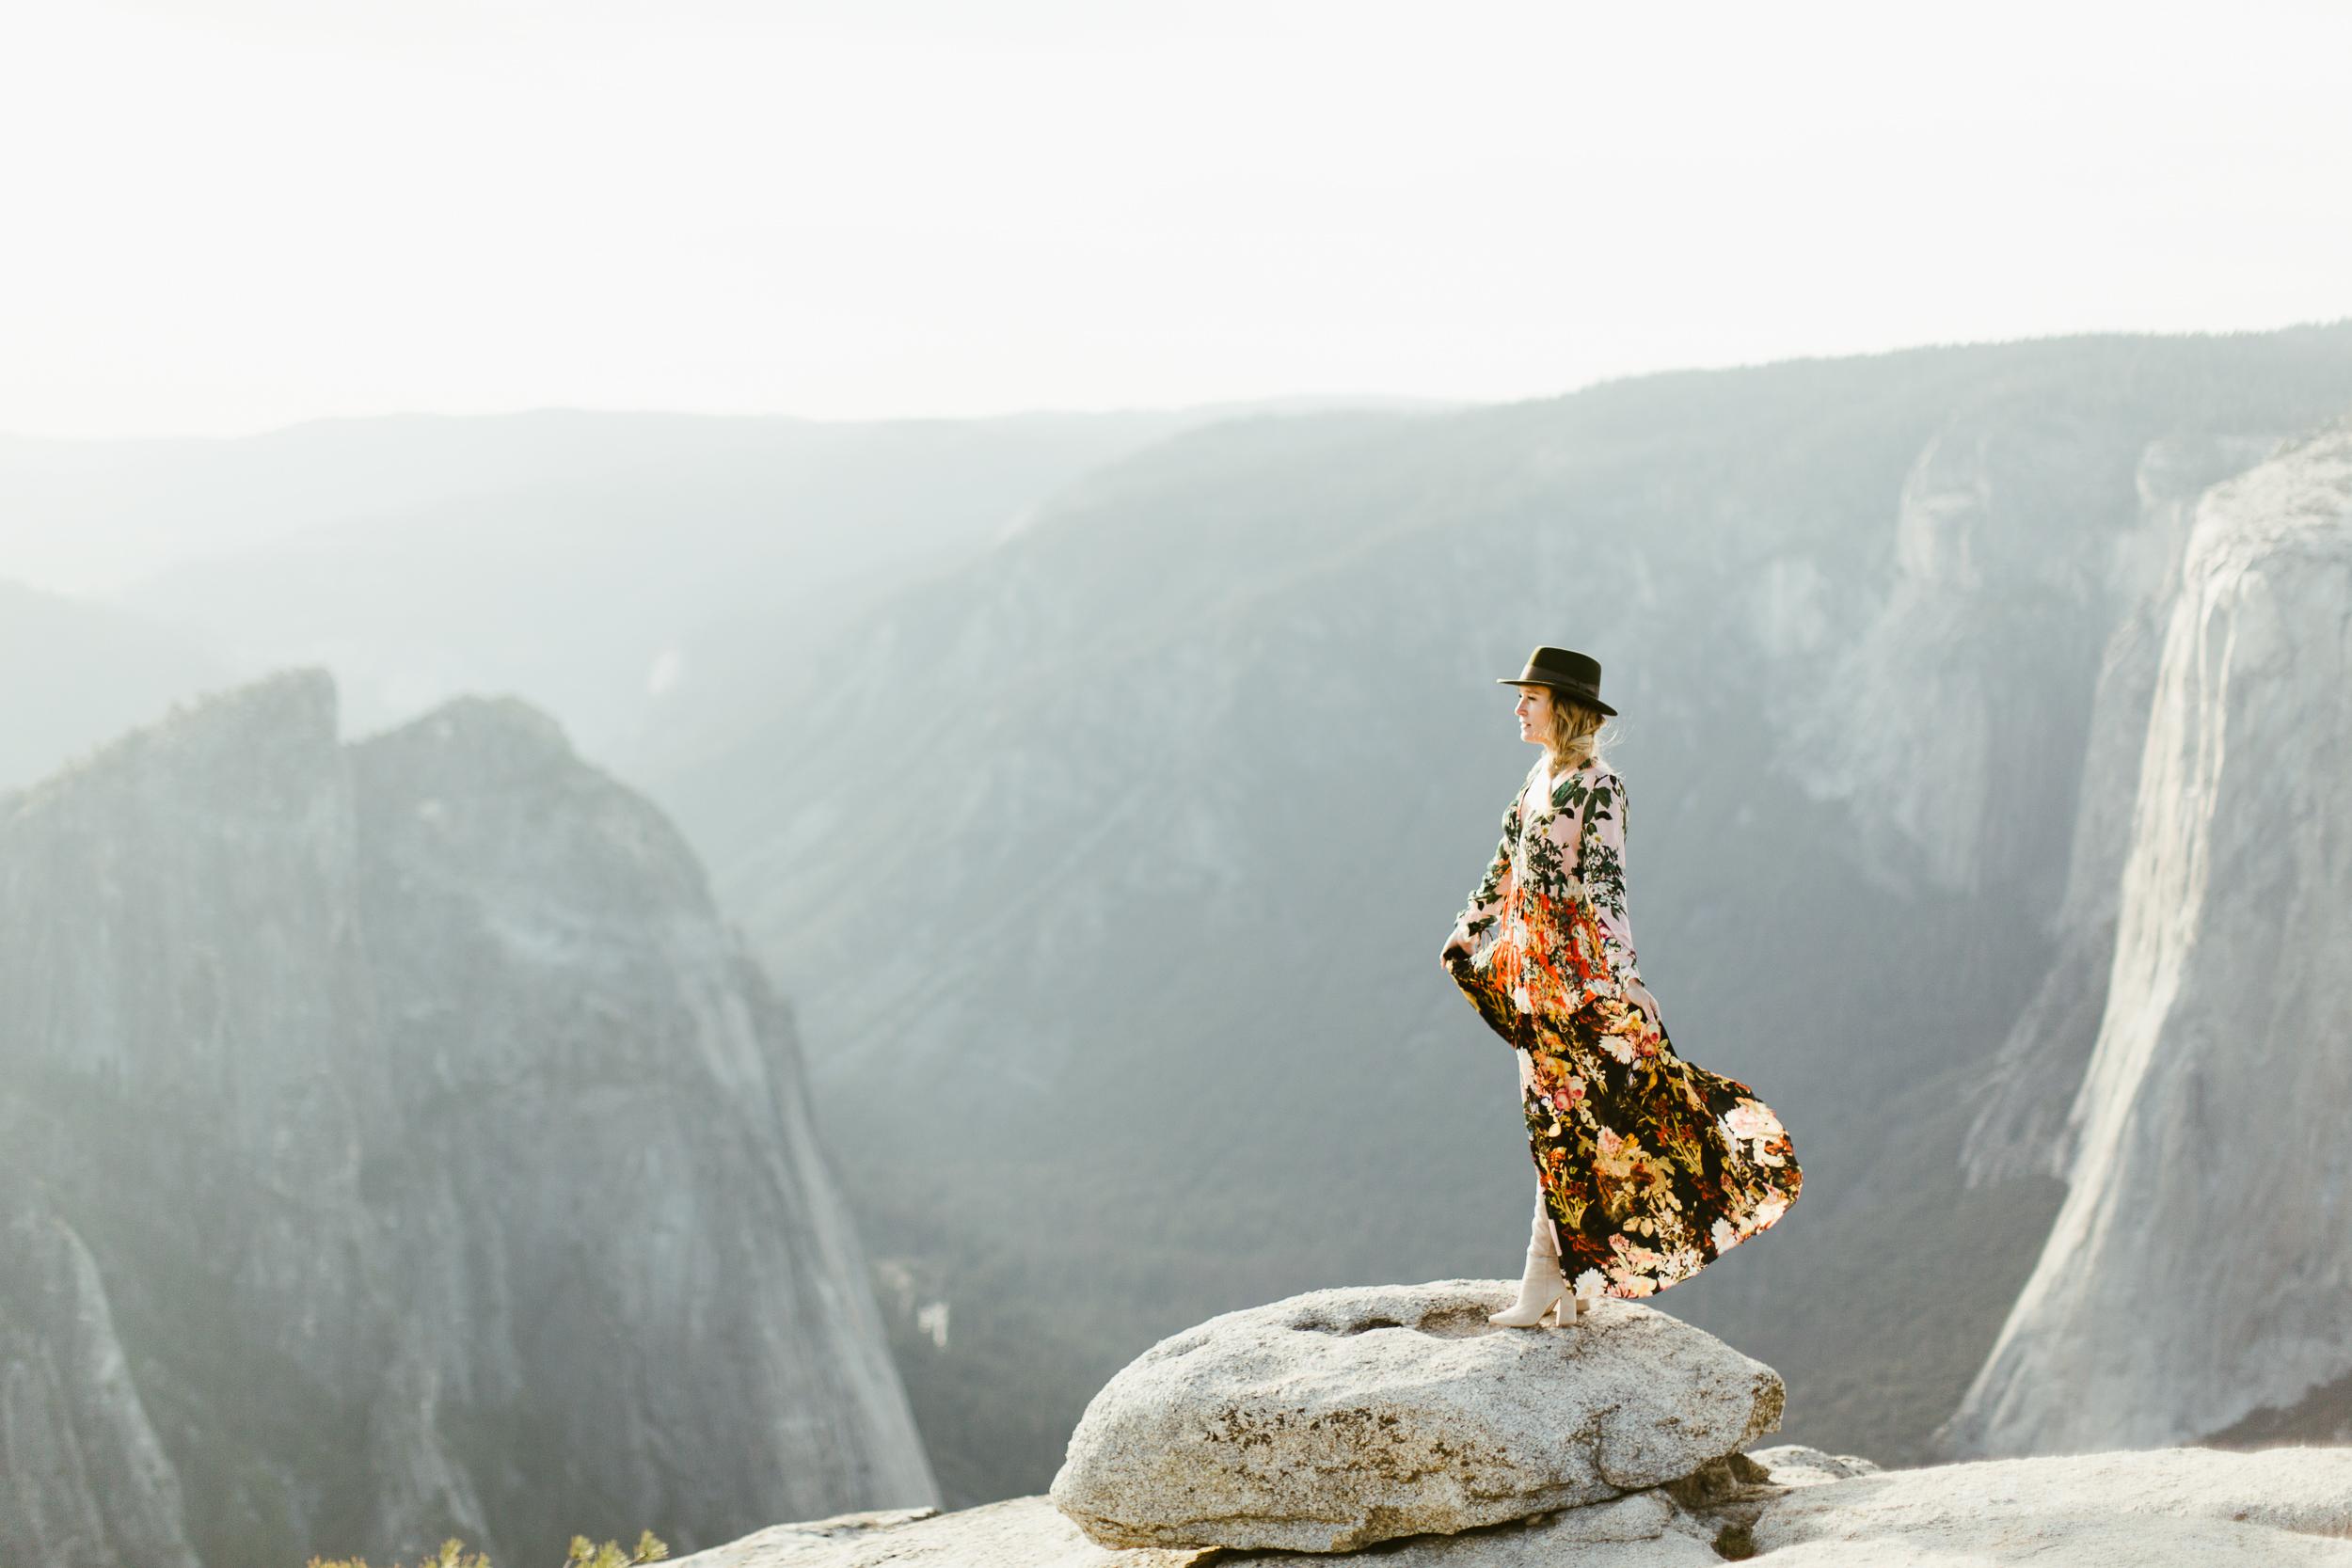 YosemiteElopementPhotographyJacquesFlynnLisaKarst07.jpg